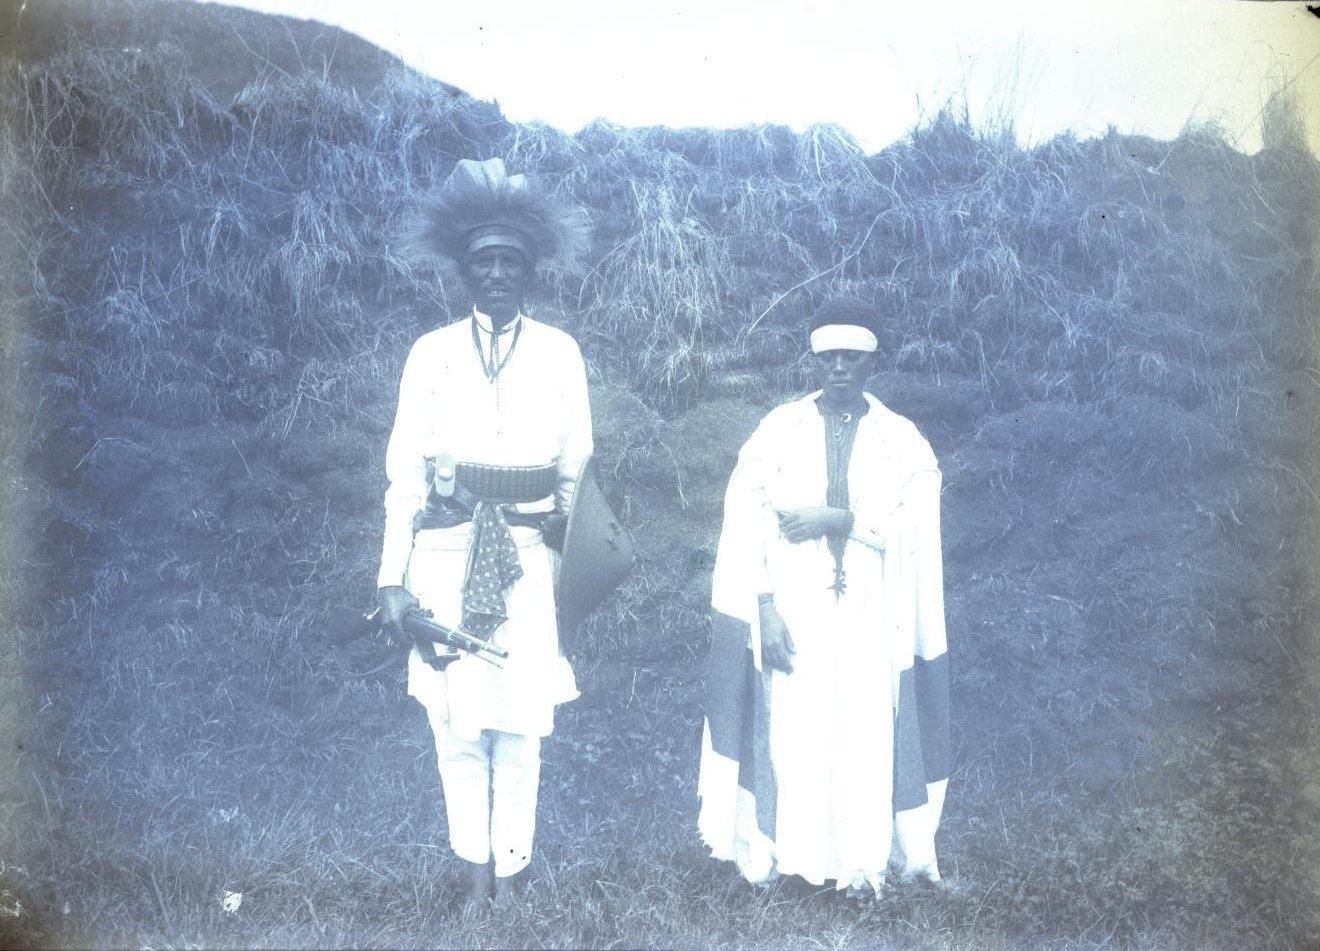 362. 1899. Абиссиния, Аддис-Абеба. Брат и сестра Габра Иеса